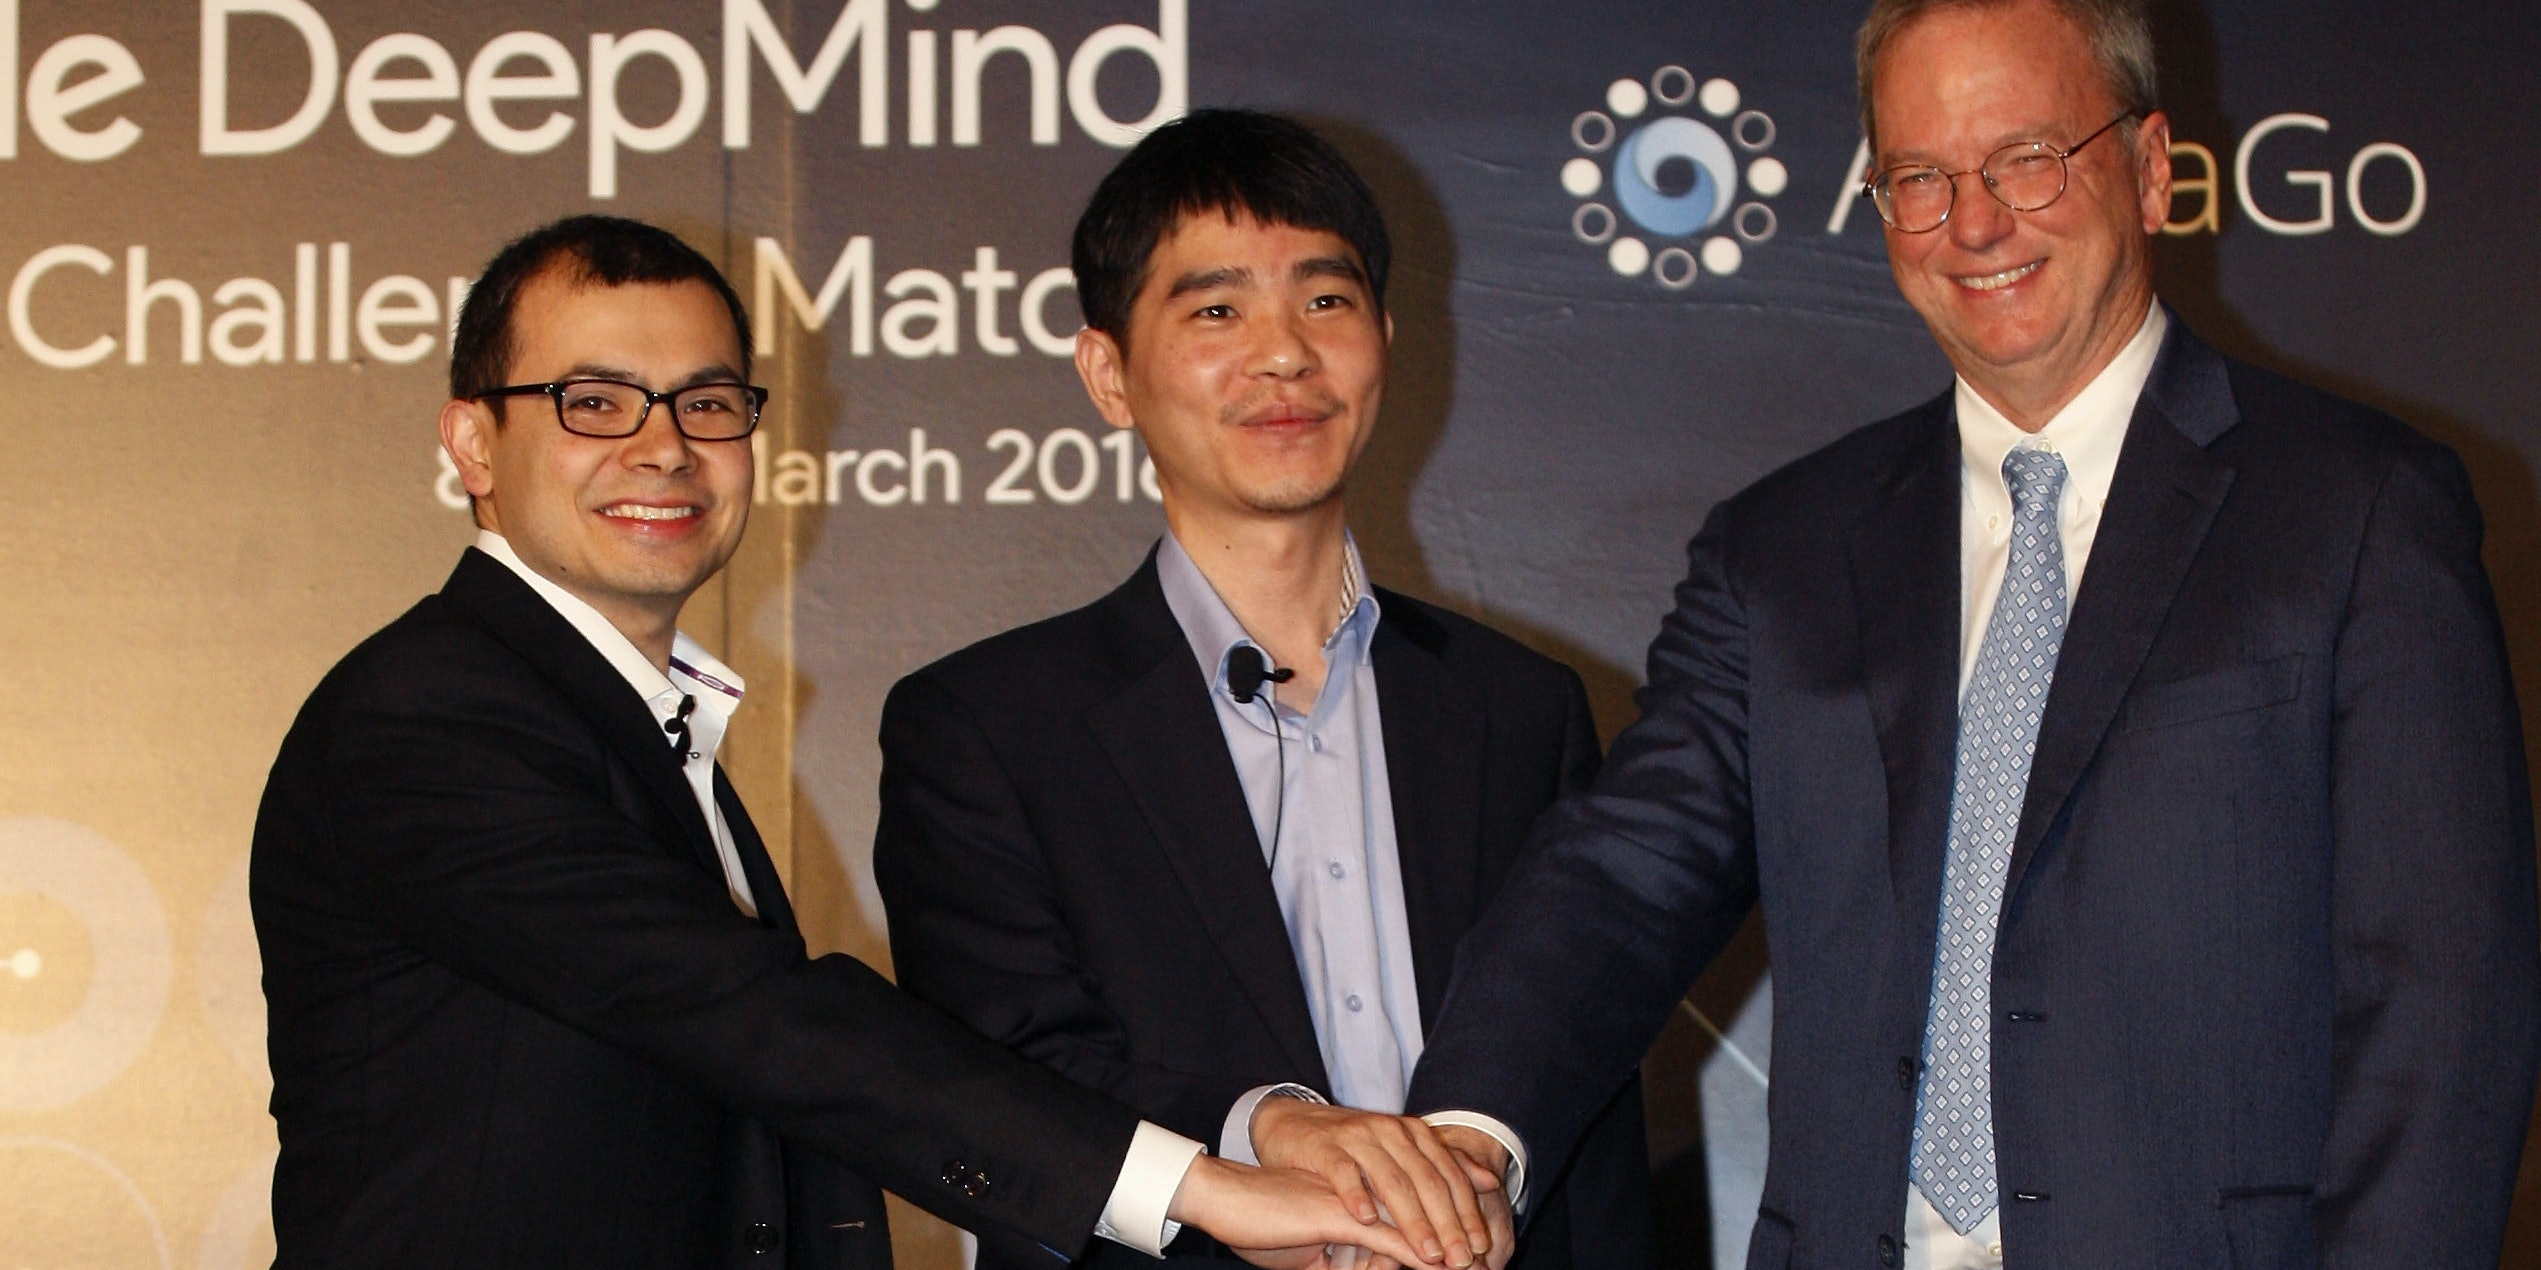 Lee Sedol vs AlphaGo DeepMind.